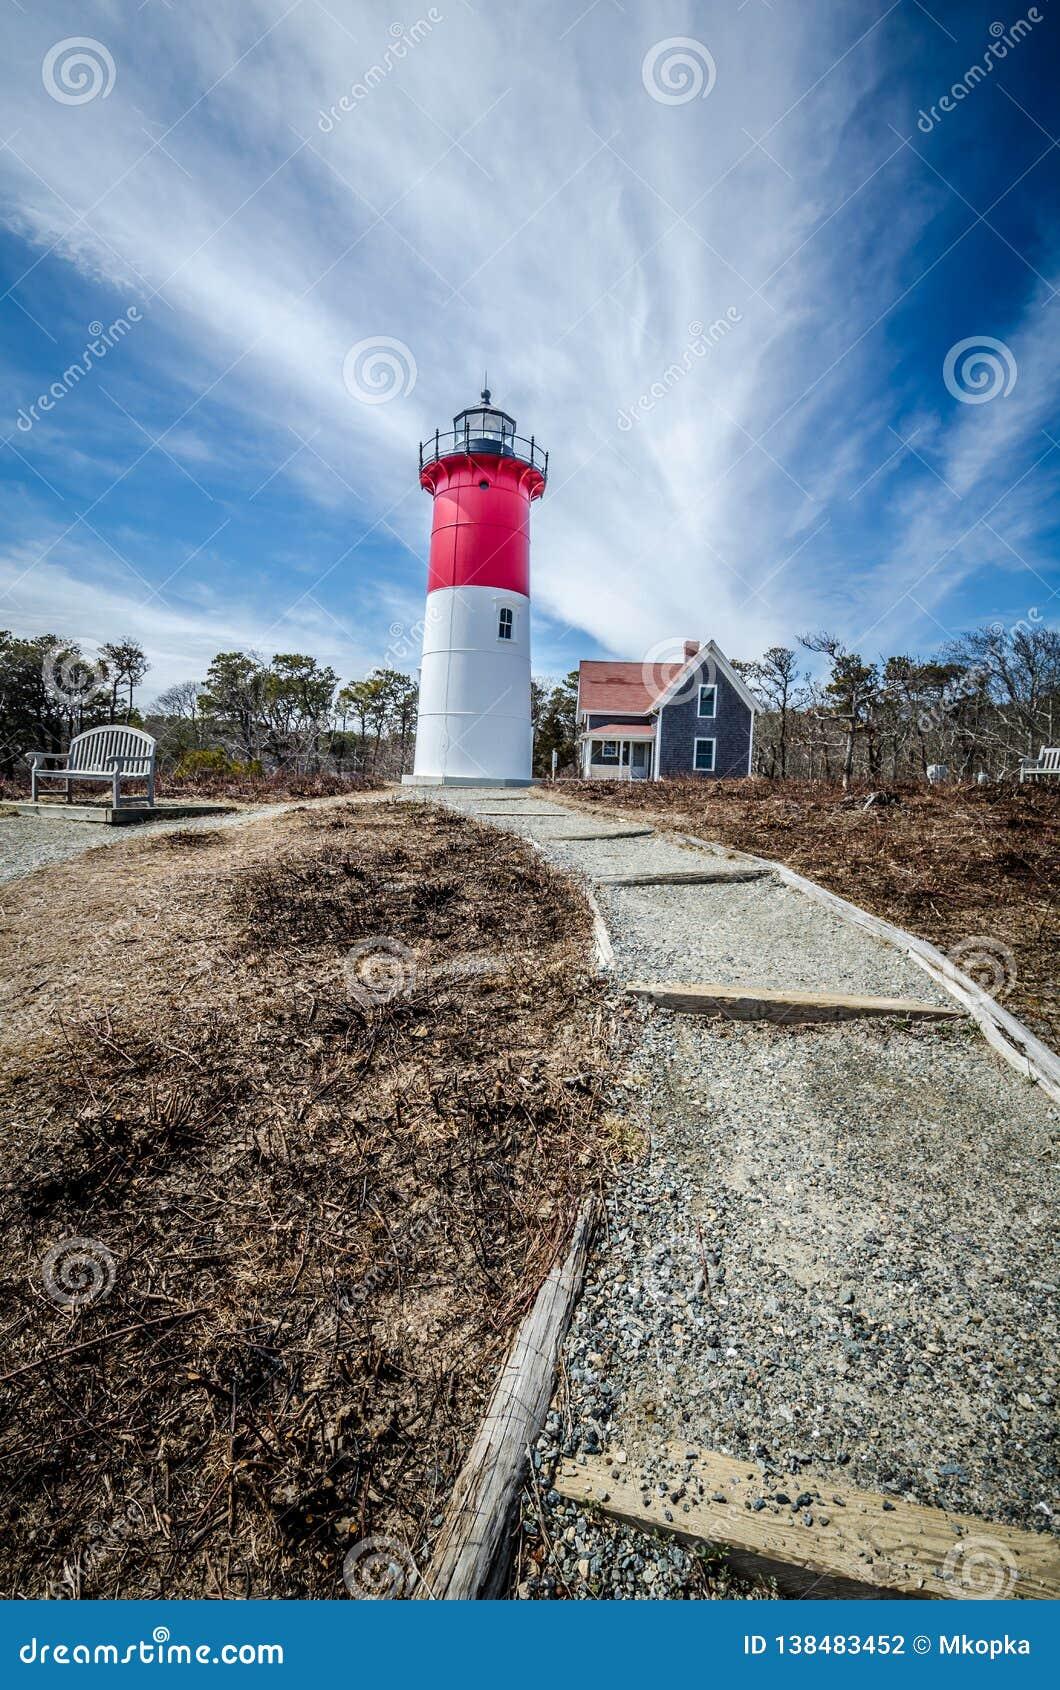 Cape Cod National Seashore - Nauset Light and Beach Area